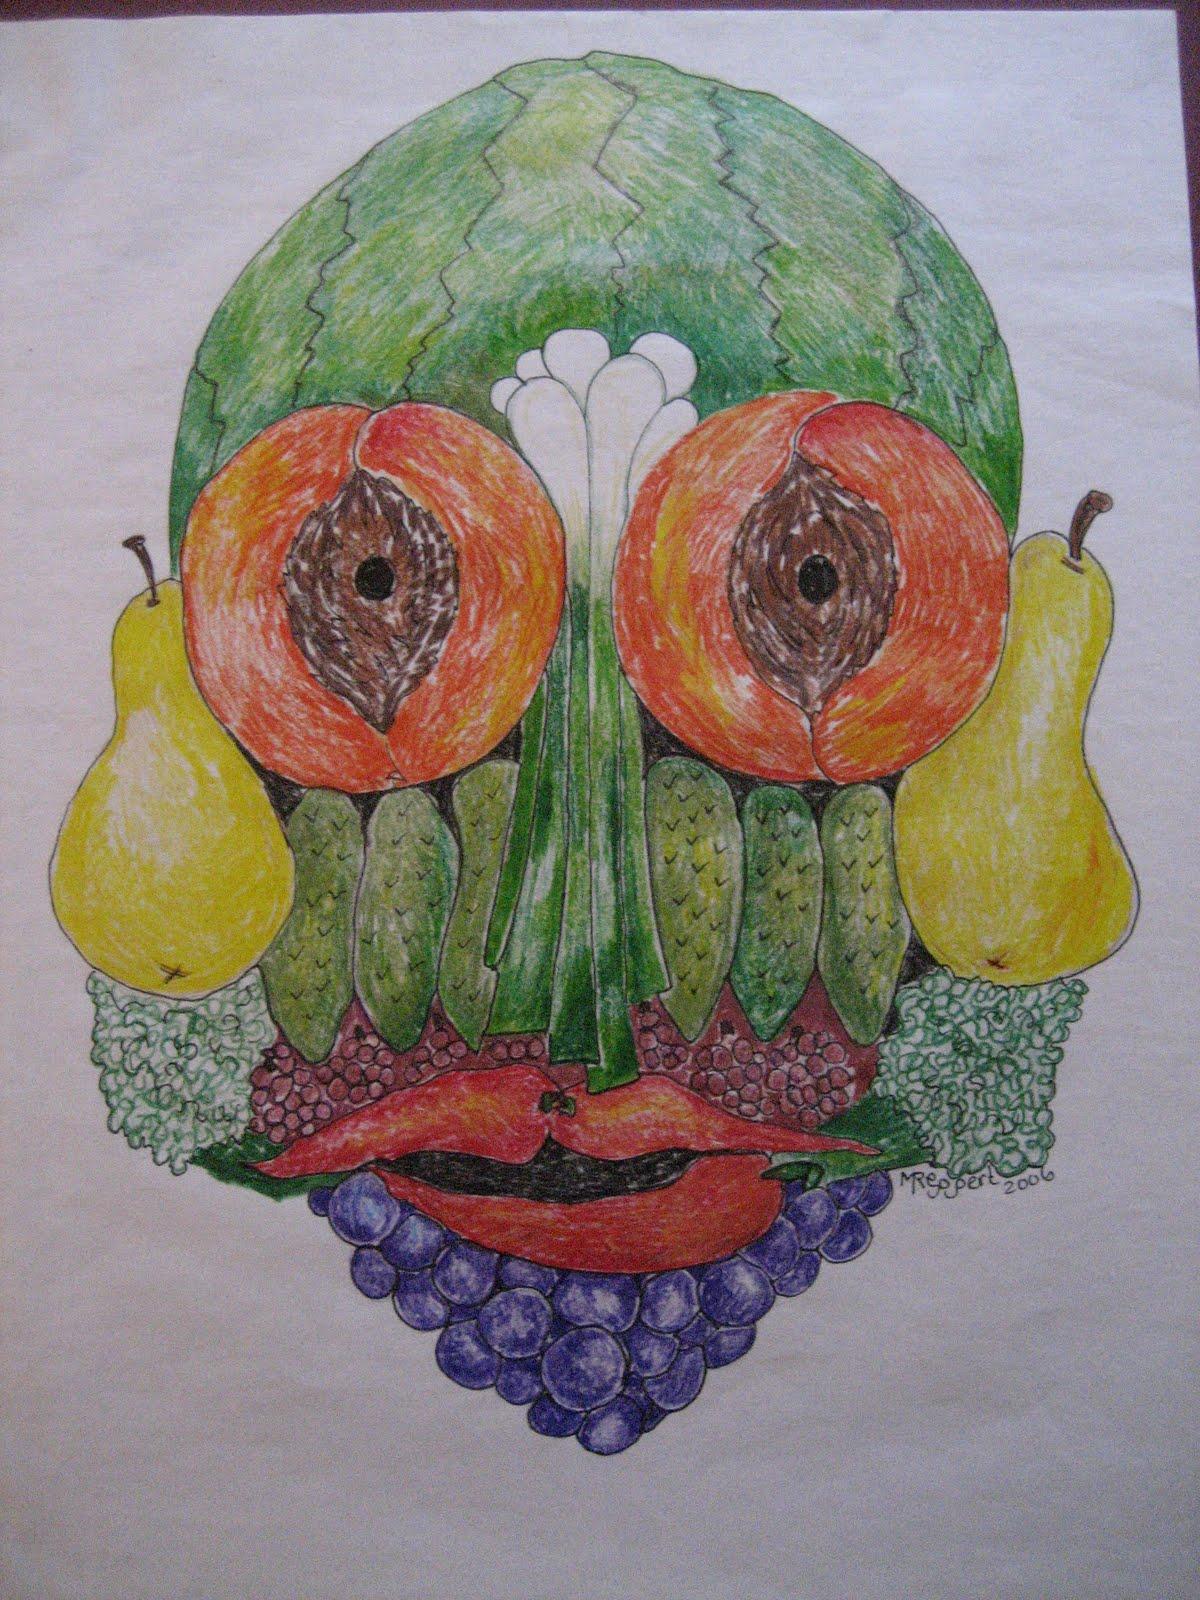 Marthann S Musings Guiseppe Arcimboldo Fruit And